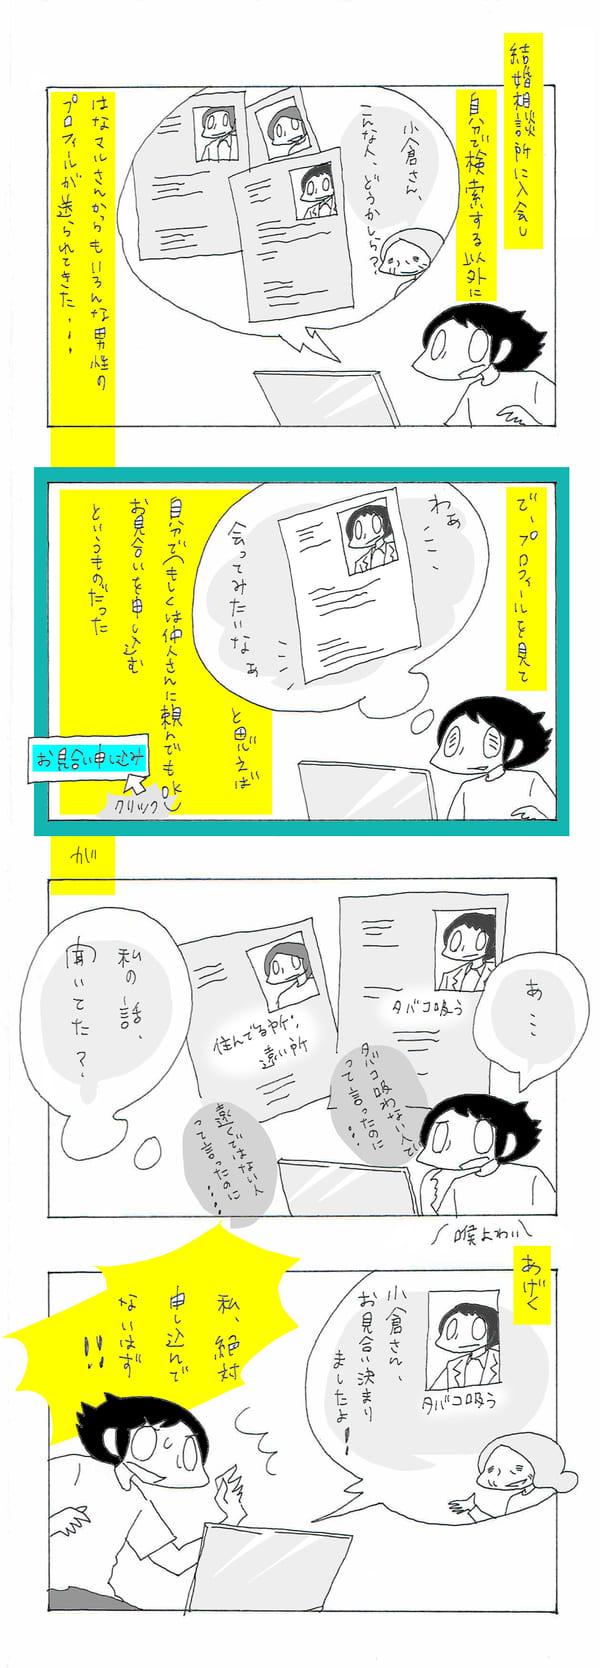 manga-soudanjyo3-1